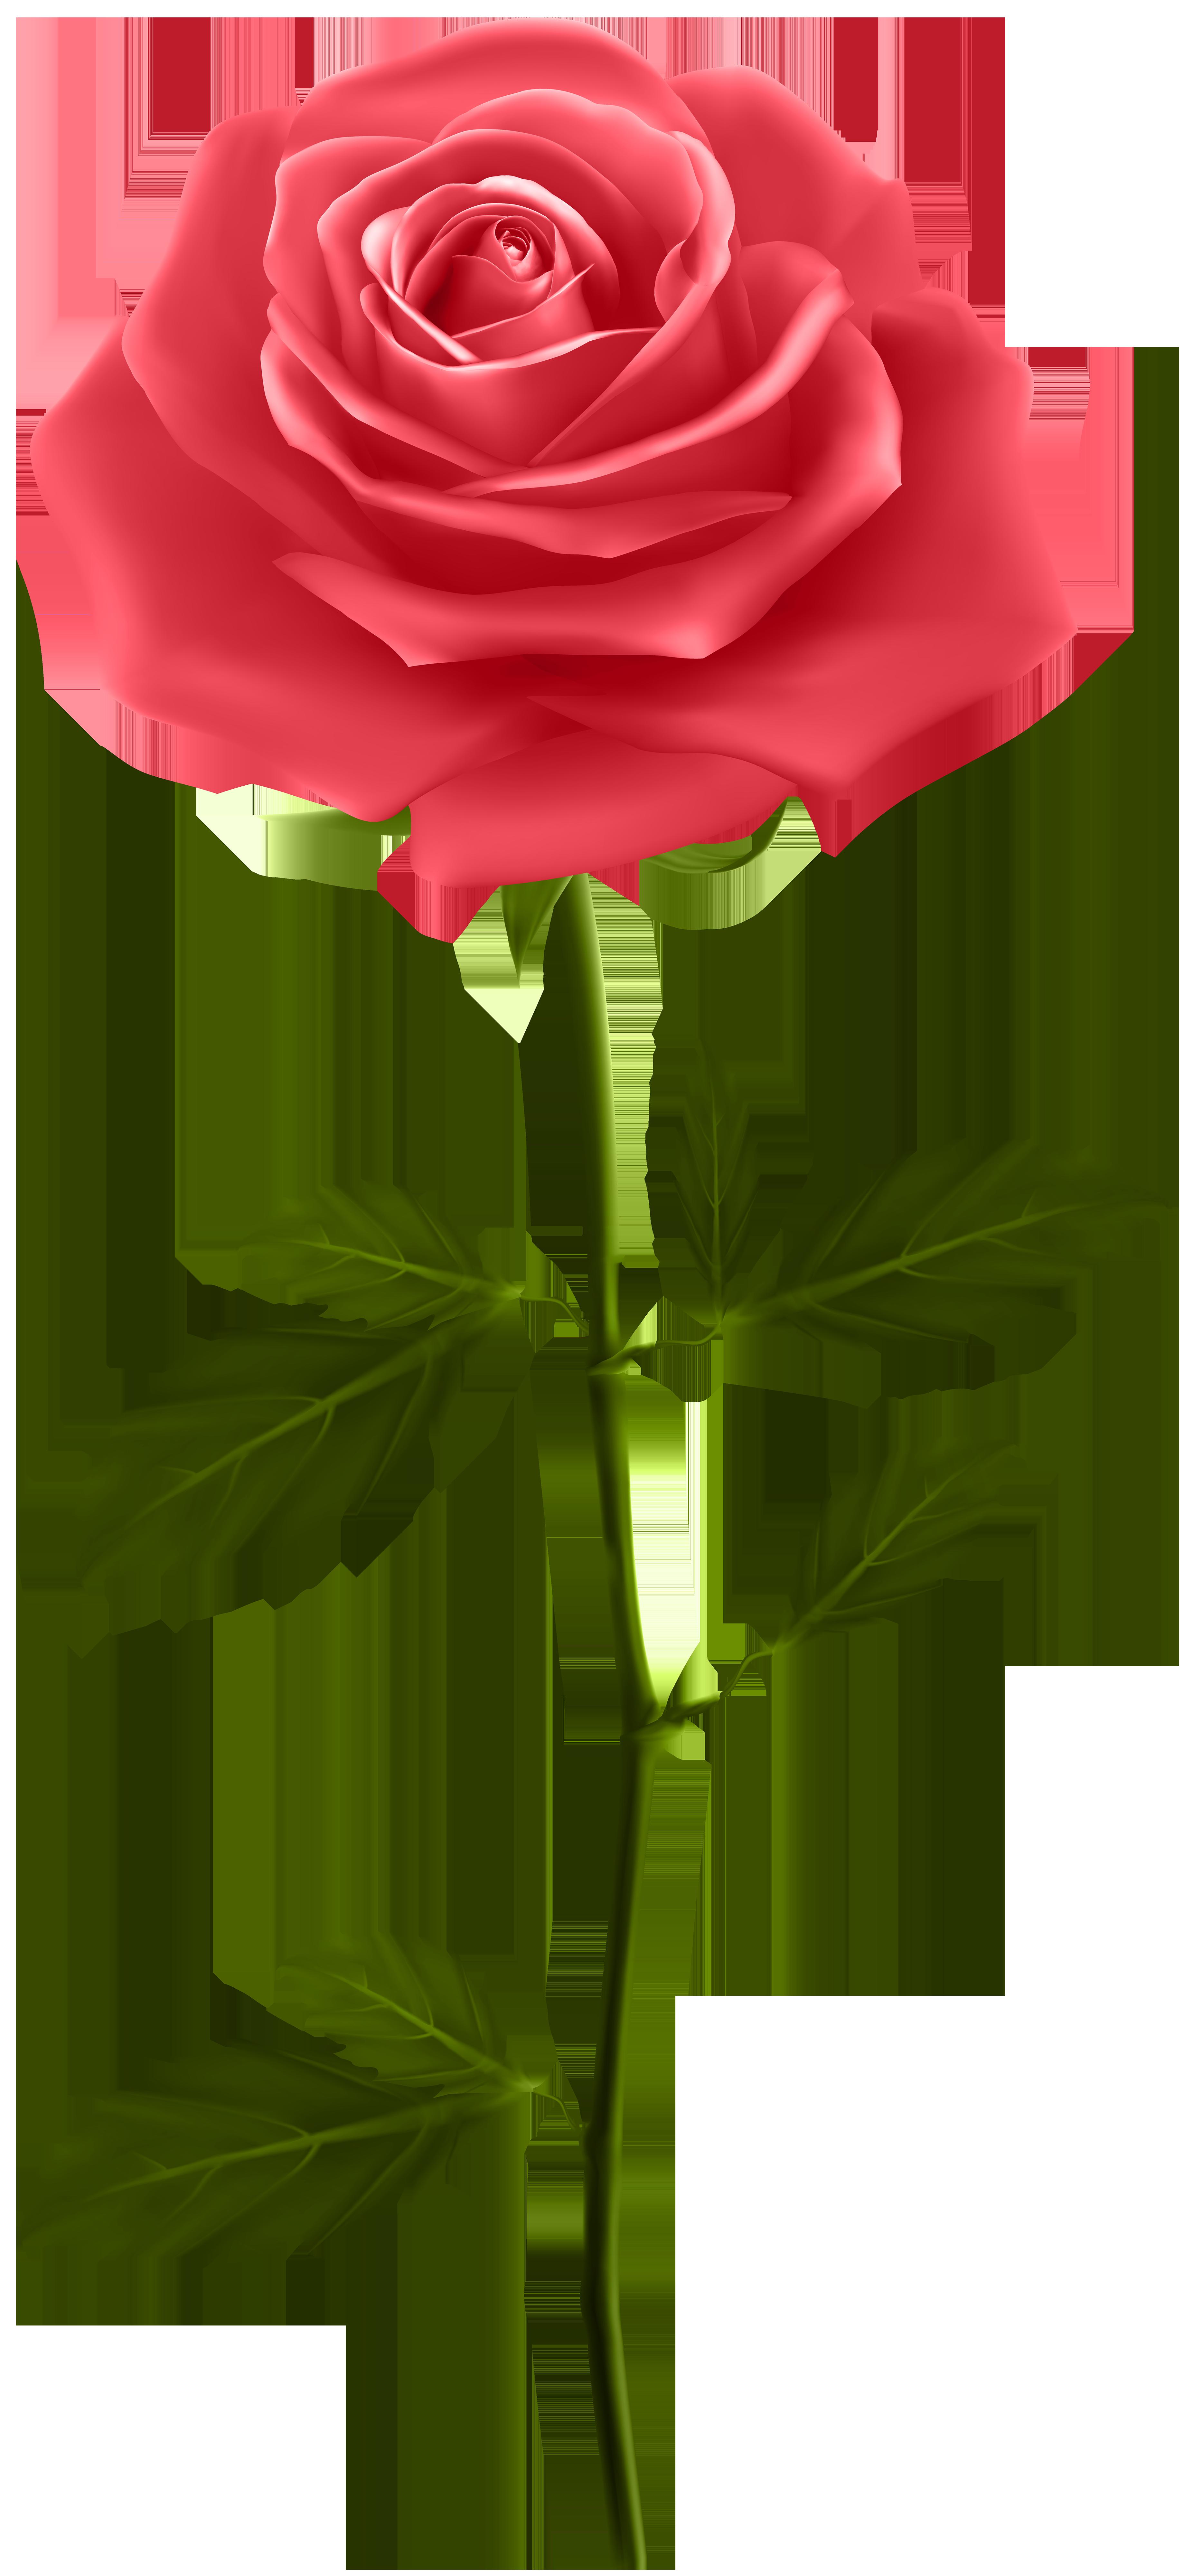 red rose with stem png clip art gallery yopriceville high rh pinterest com Flower Stem Drawing Flower Garden Clip Art